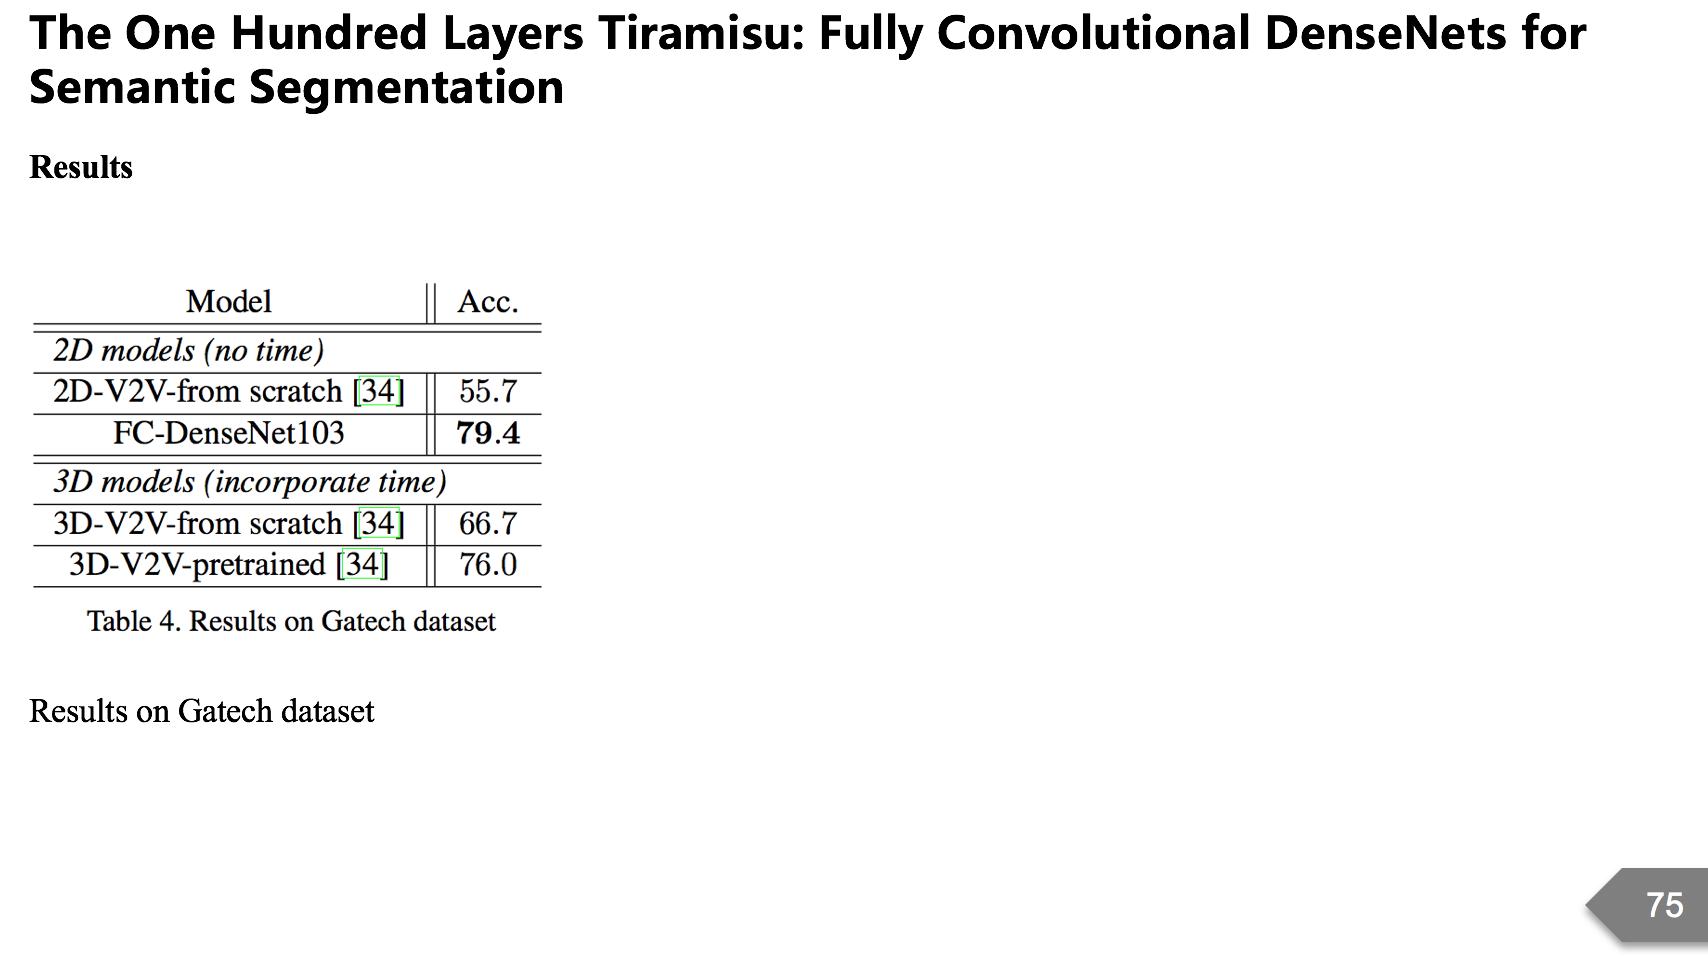 The One Hundred Layers Tiramisu: Fully Convolutional